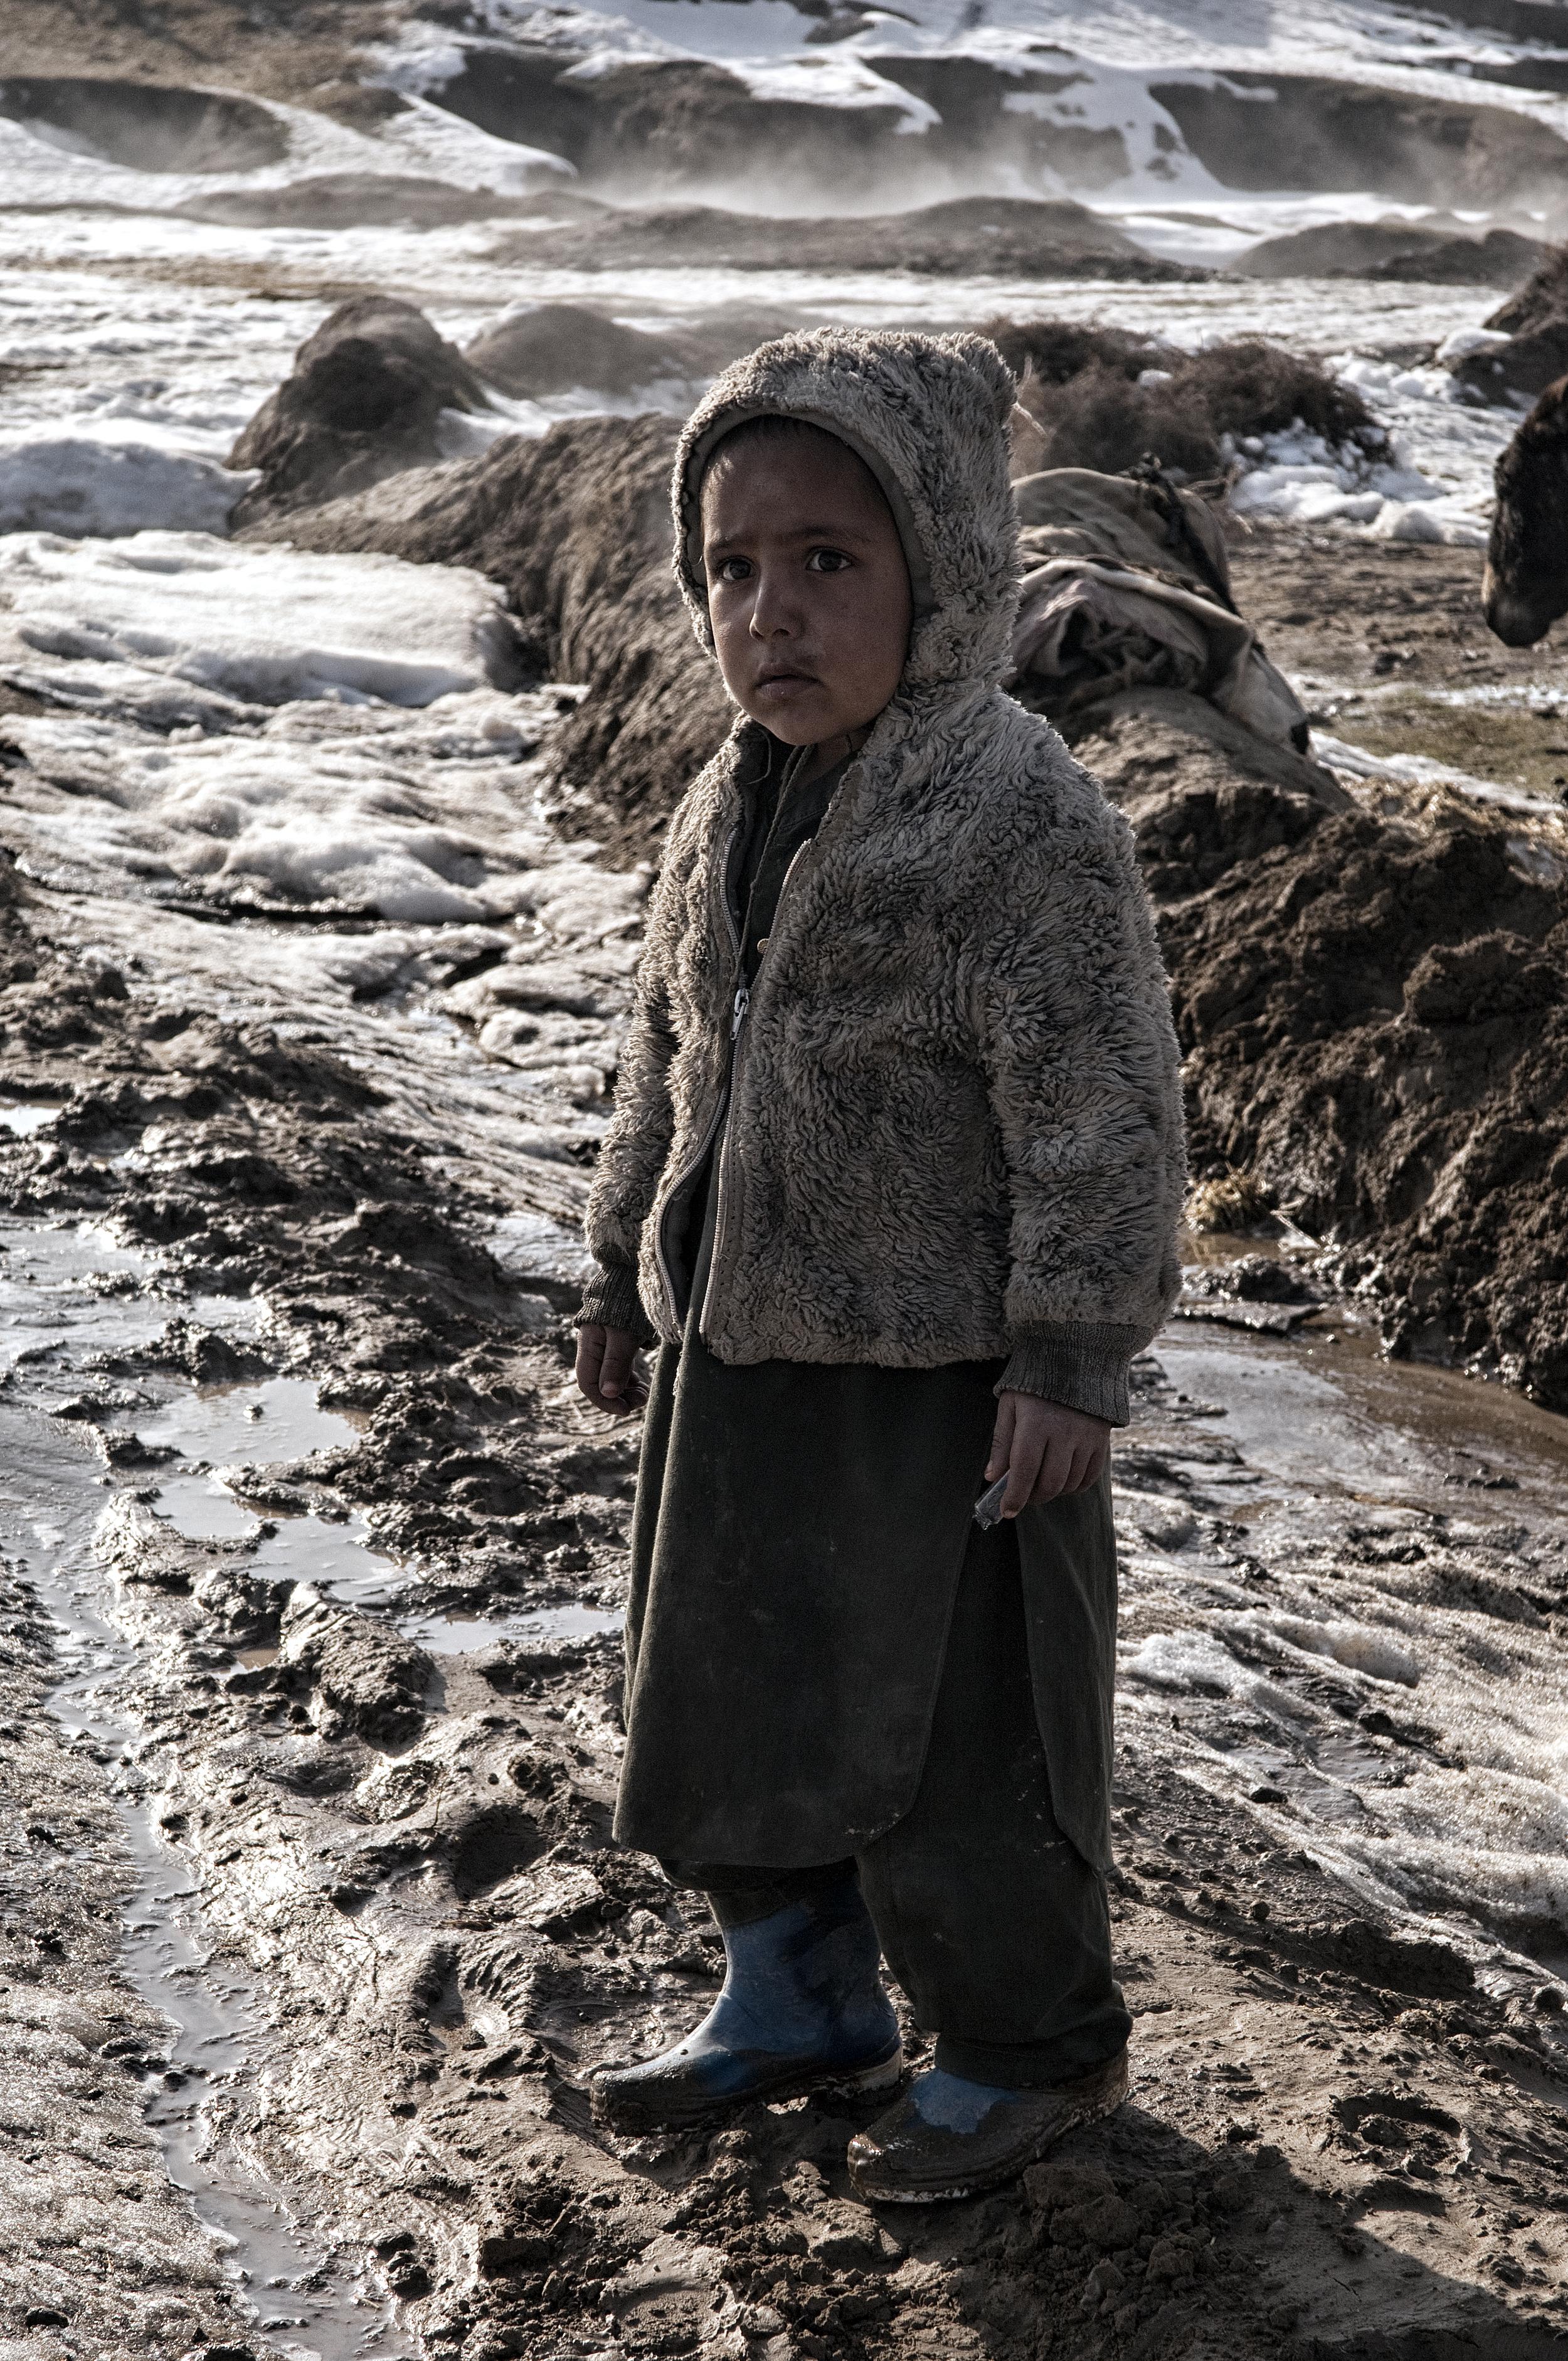 A young Afghan boy in the village of Qasabach Qala, Faryab Province, Northwest Afghanistan on Friday 15th February, 2008.